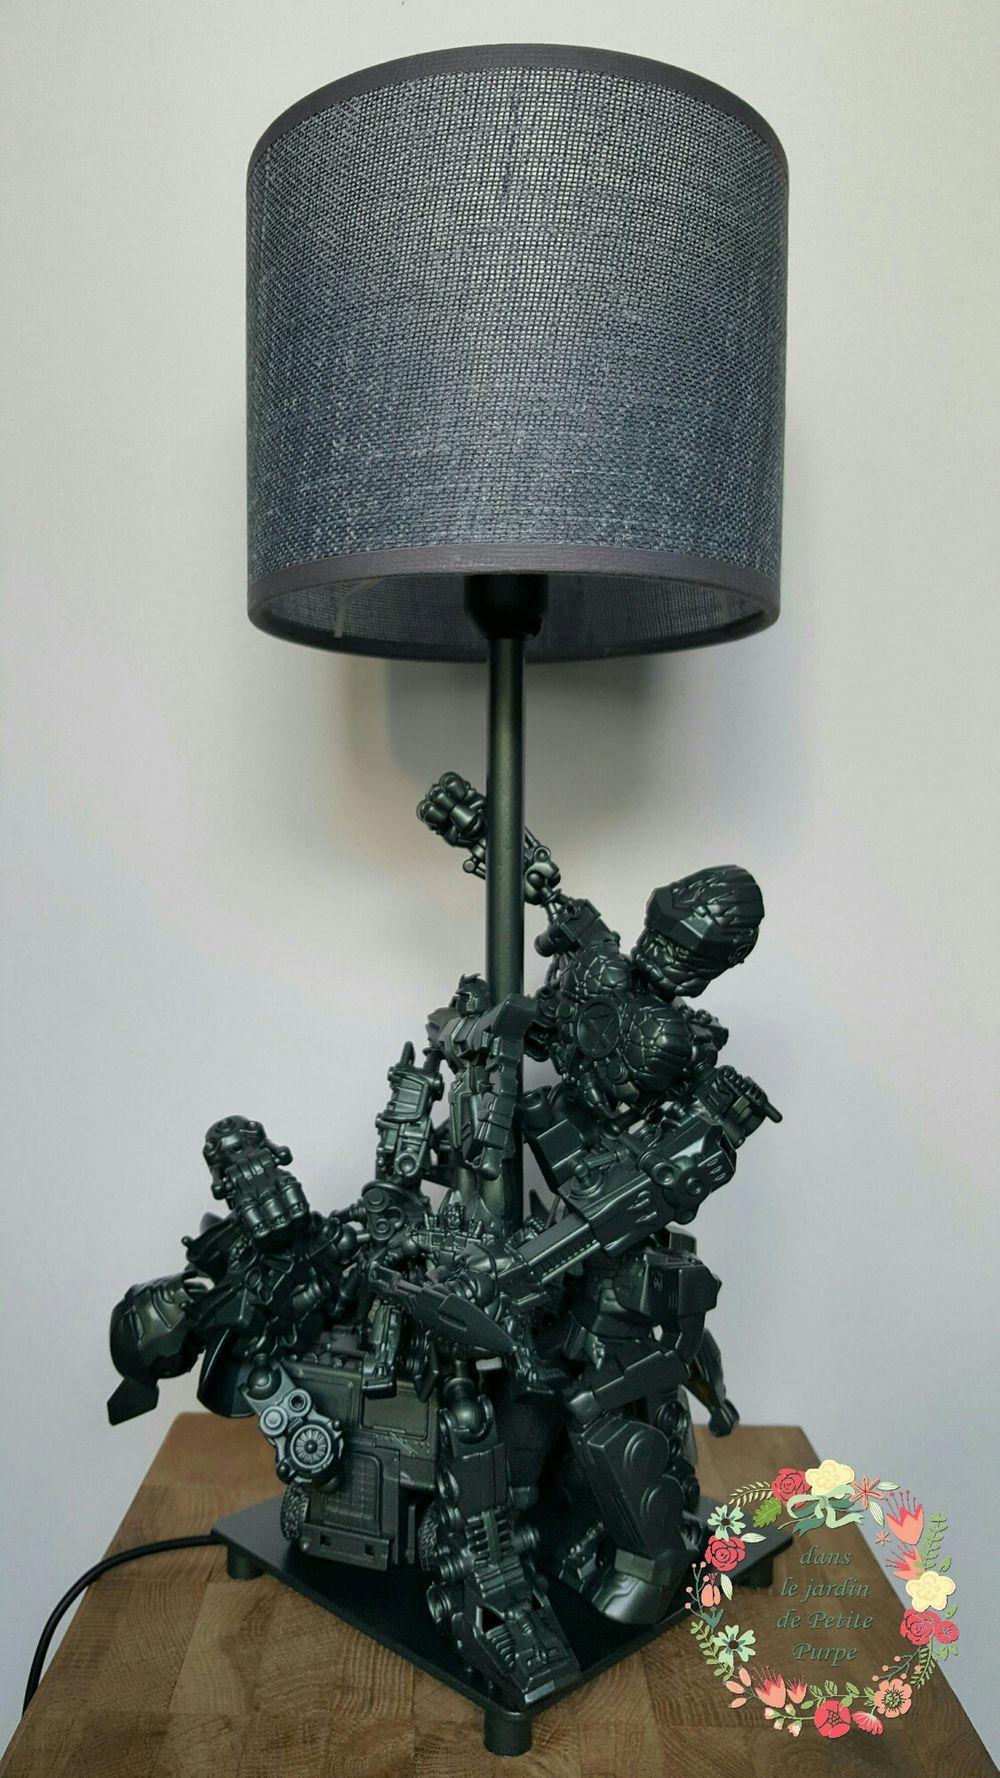 lampe figurines d 39 action cadeau geek marvel dc et dc comics. Black Bedroom Furniture Sets. Home Design Ideas